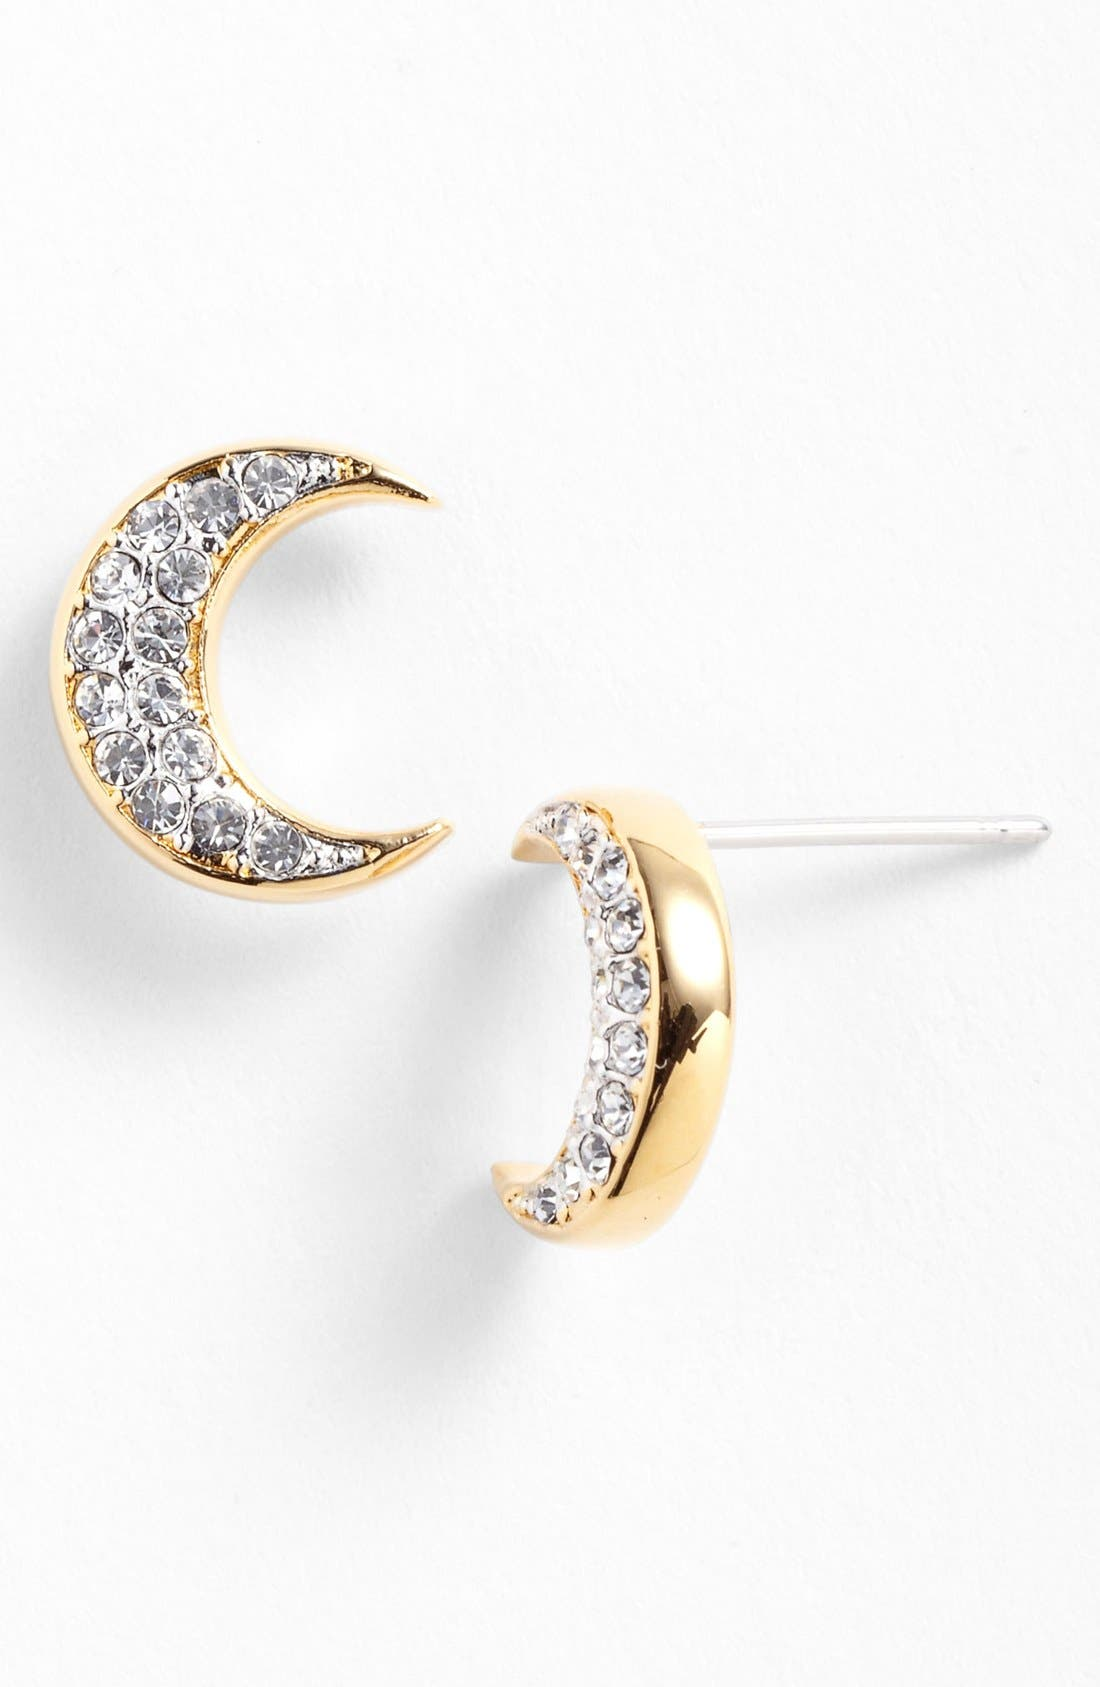 Main Image - Nadri 'Charmers' Pavé Symbol Stud Earrings (Nordstrom Exclusive)